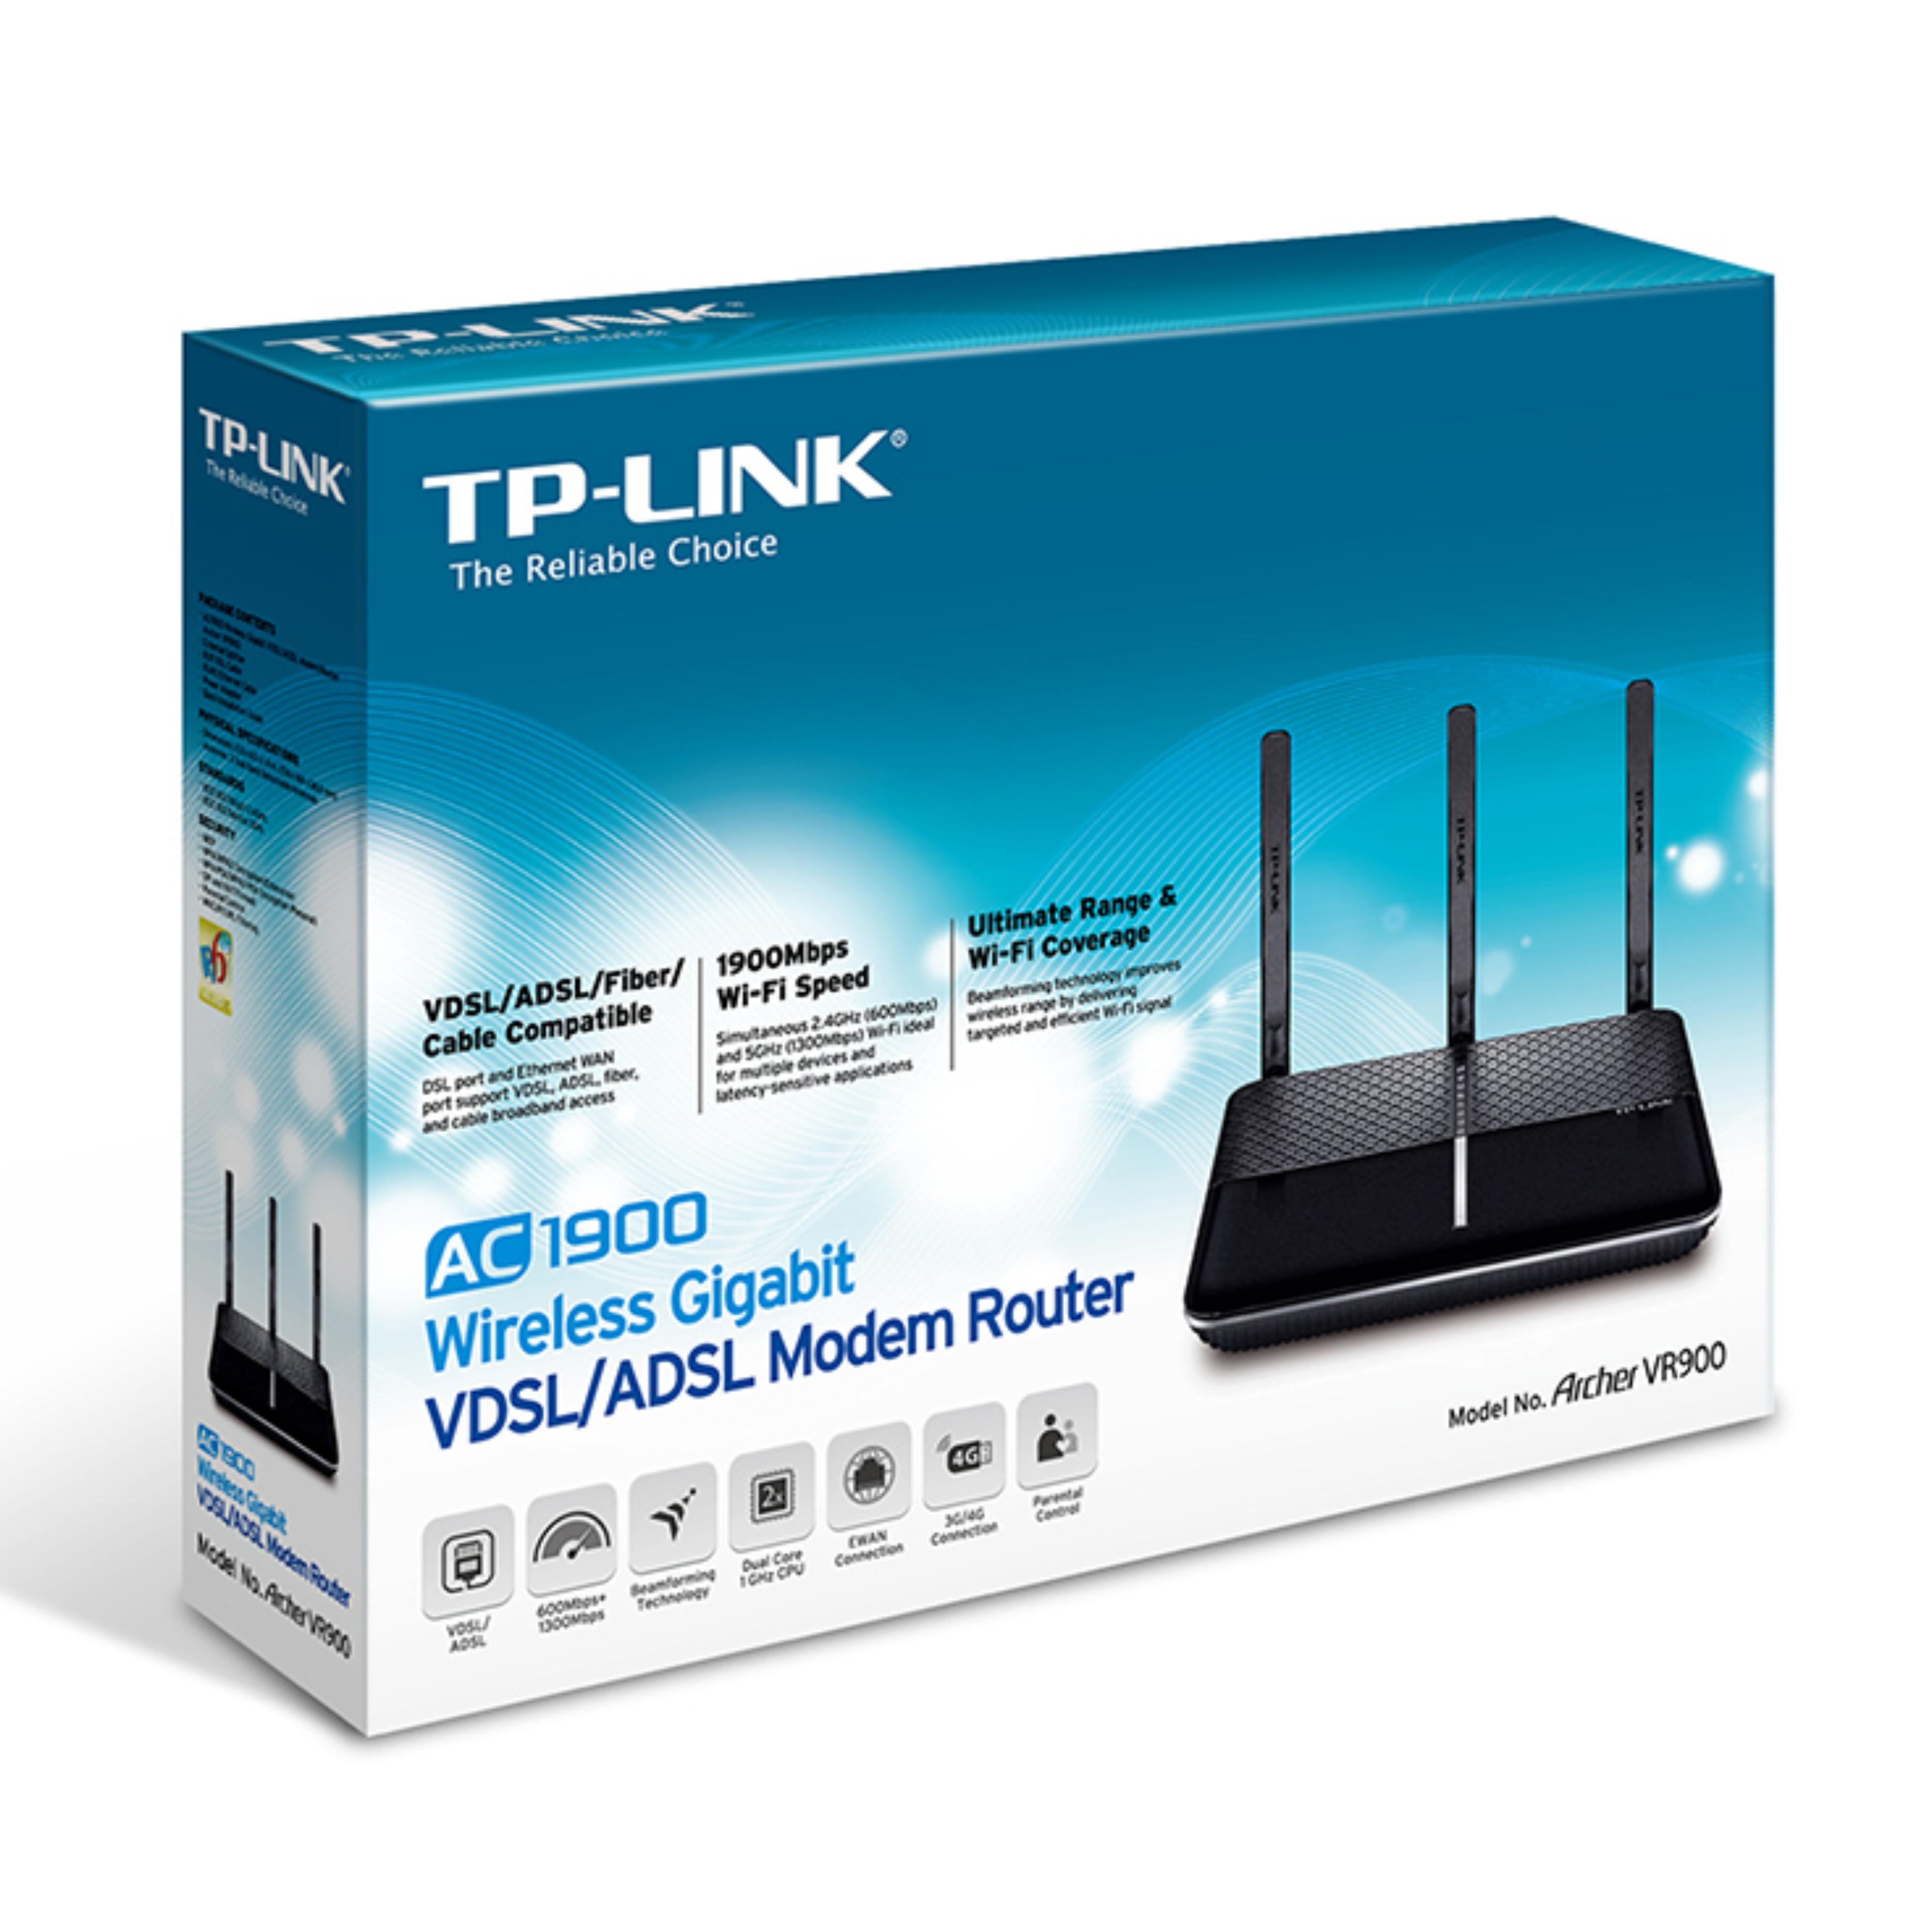 TP-Link ARCHER VR900 V2 |AC1900 Wireless Gigabit VDSL/ADSL Modem ...